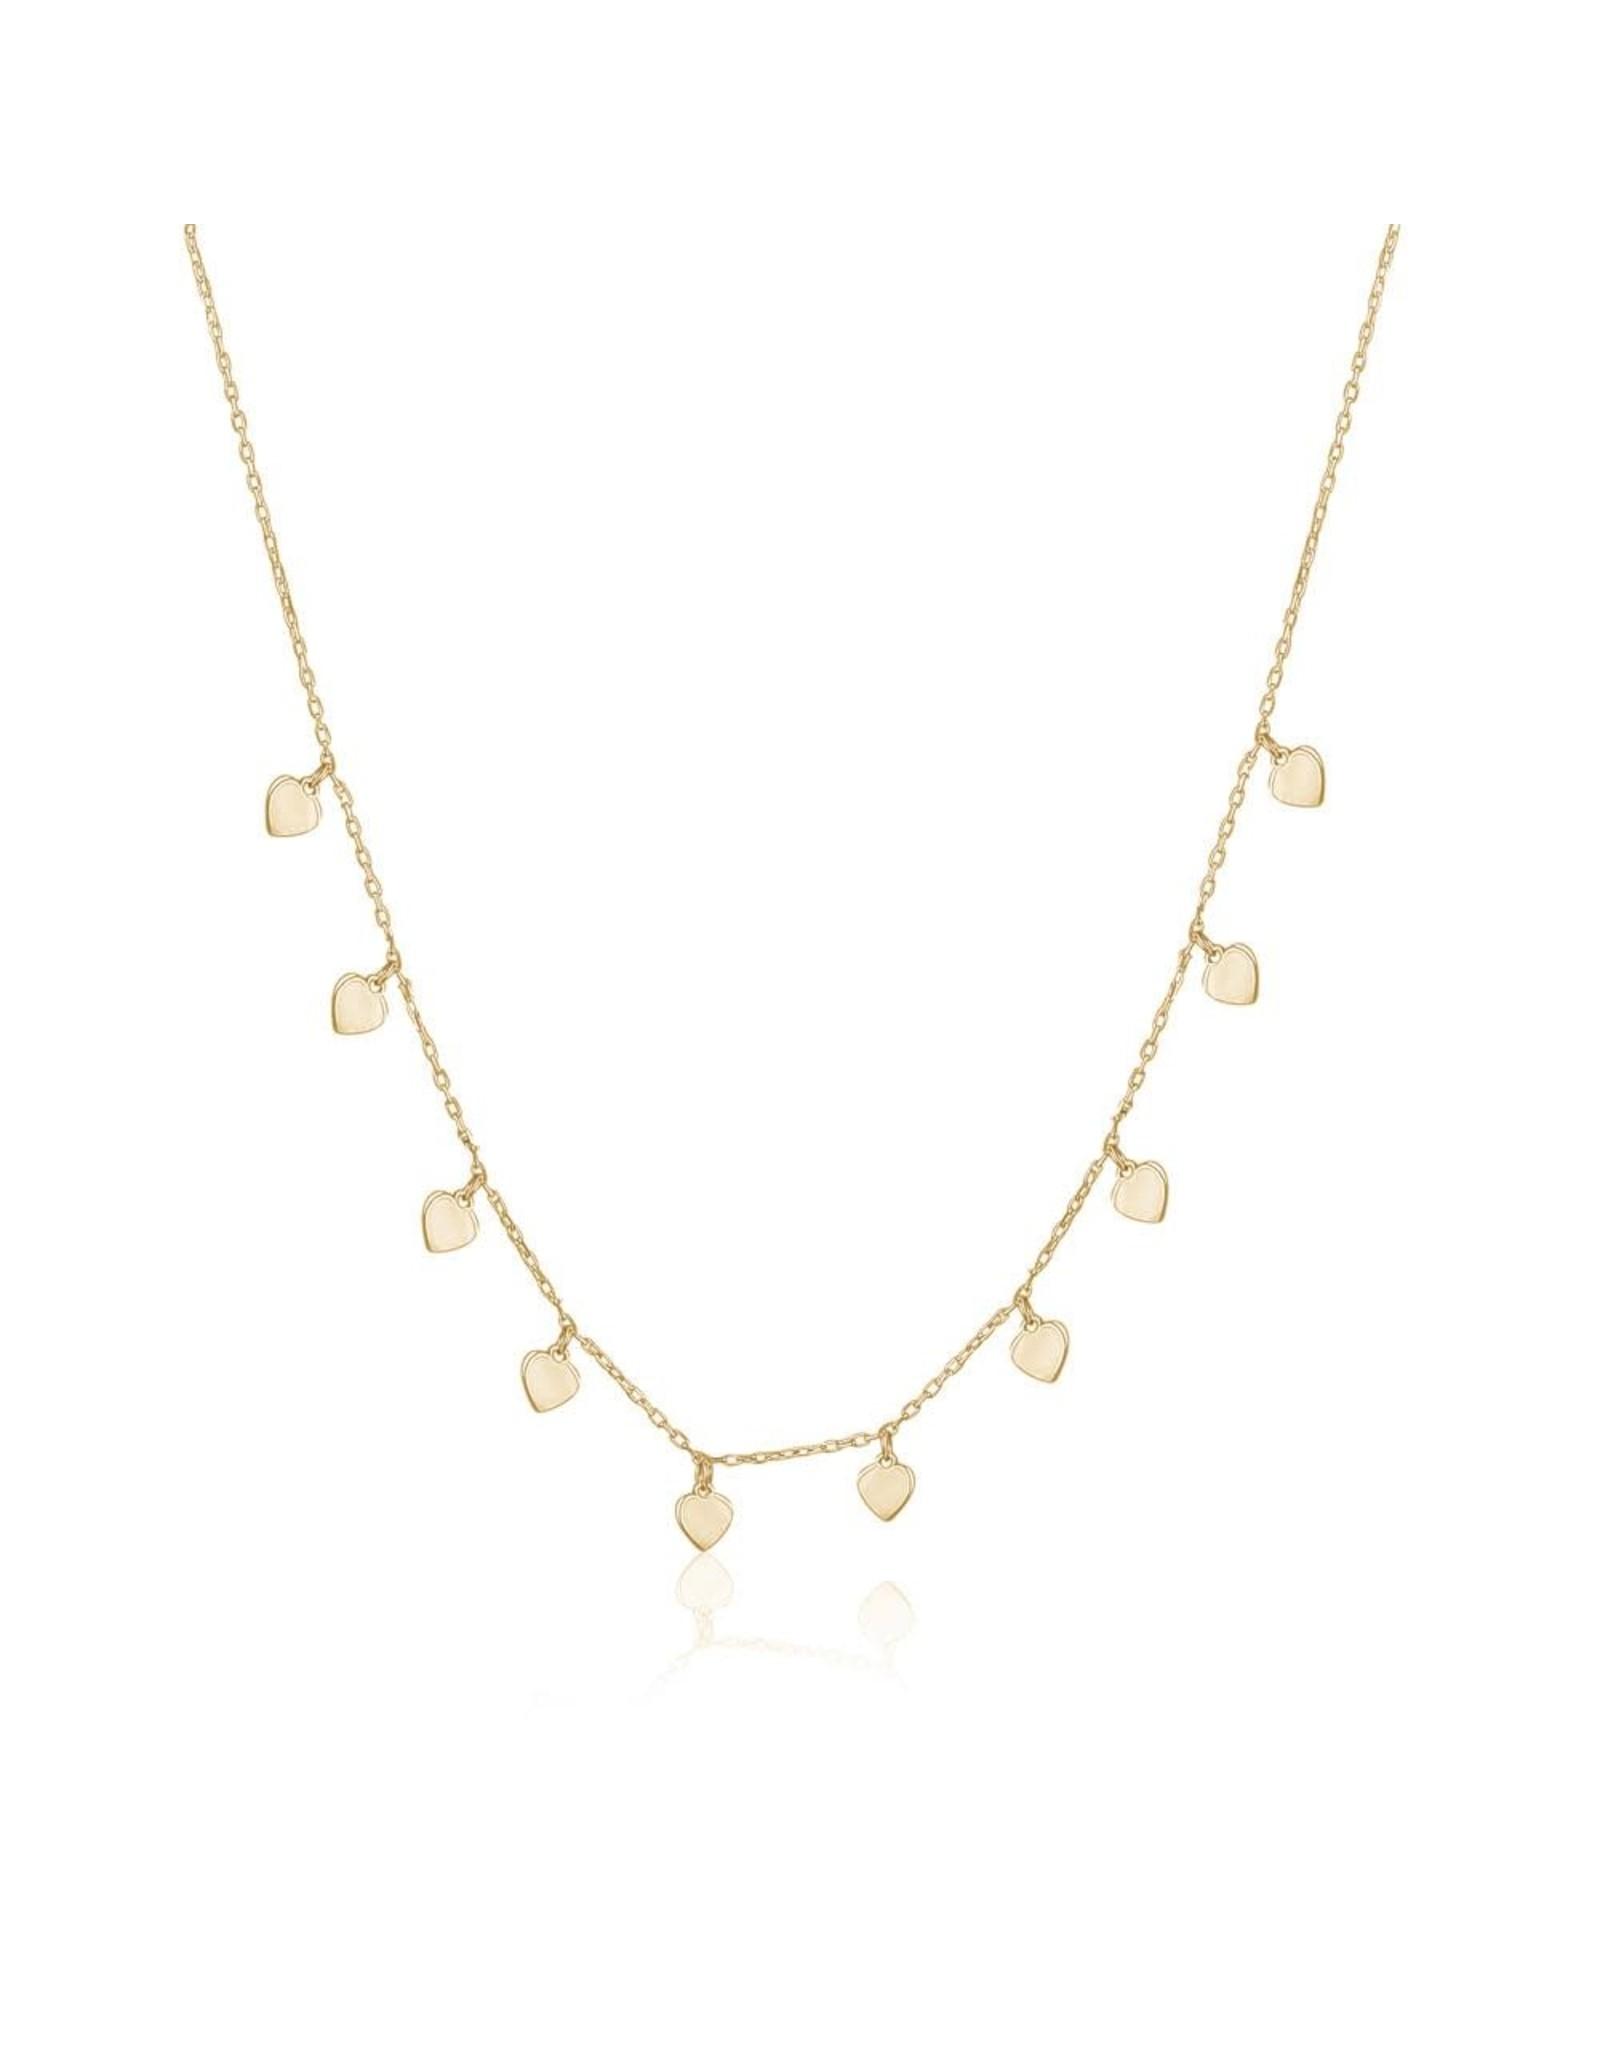 Limlim Dainty Hearts Necklace